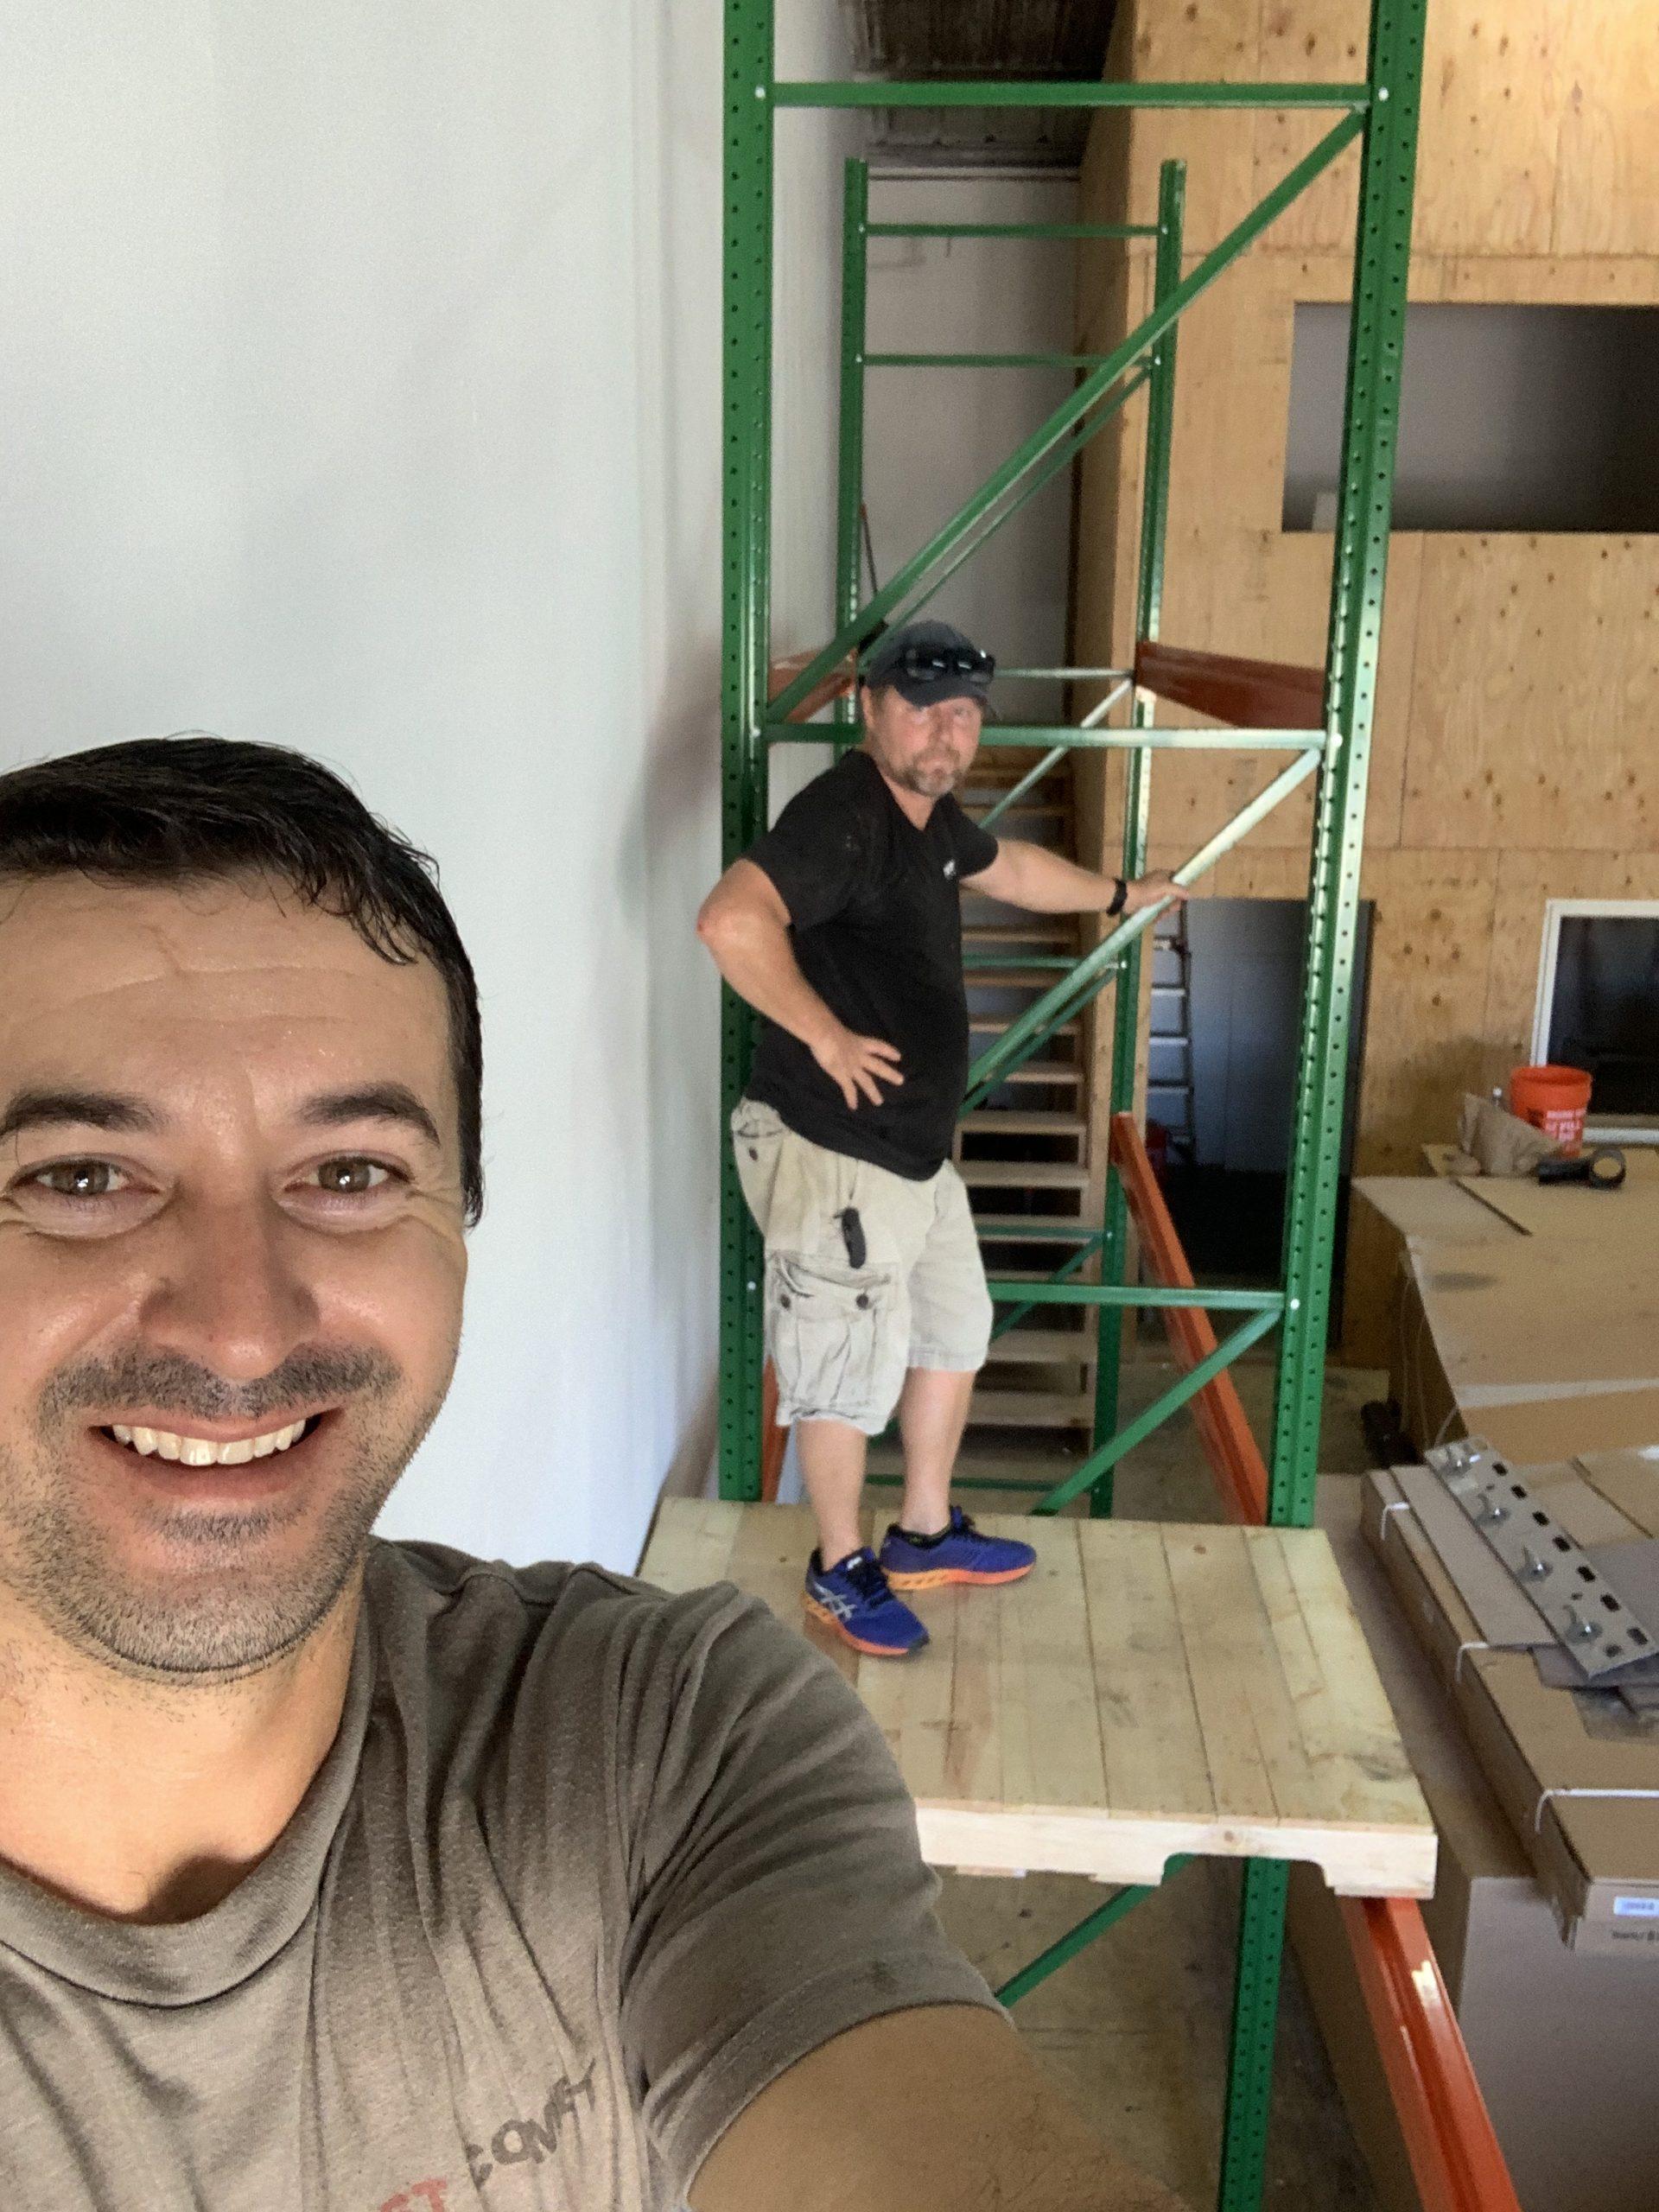 Fast Comet Warehouse 10 - Maui Hawaii - Movers